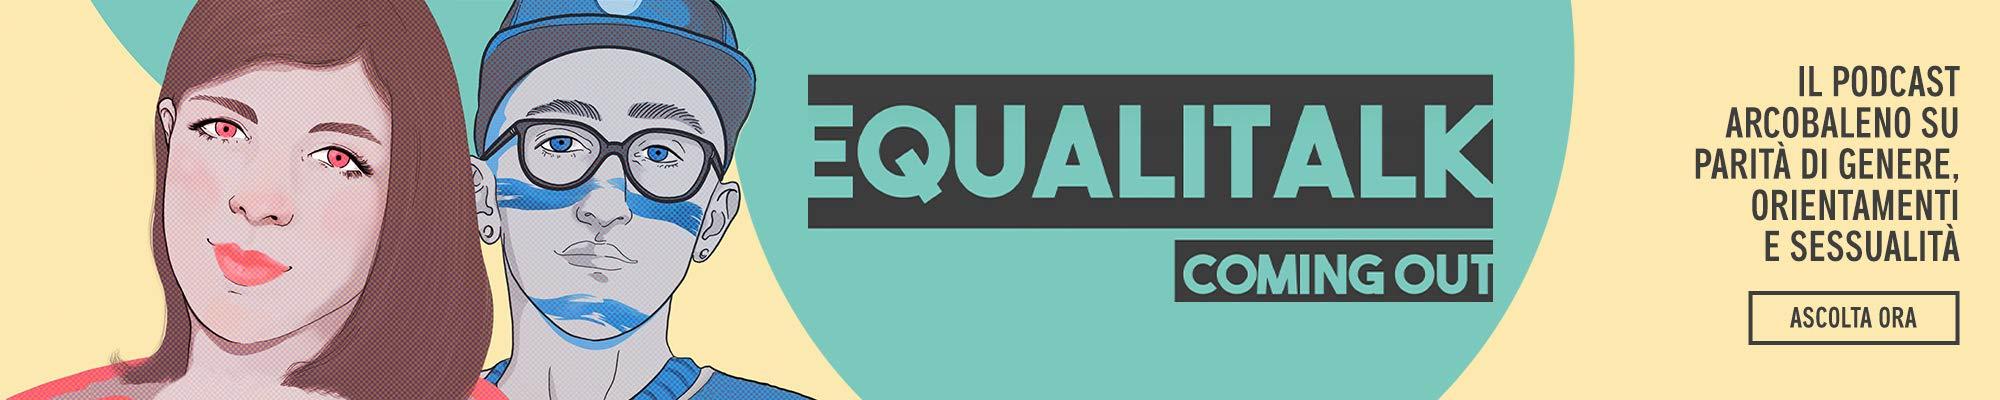 Equalitalk